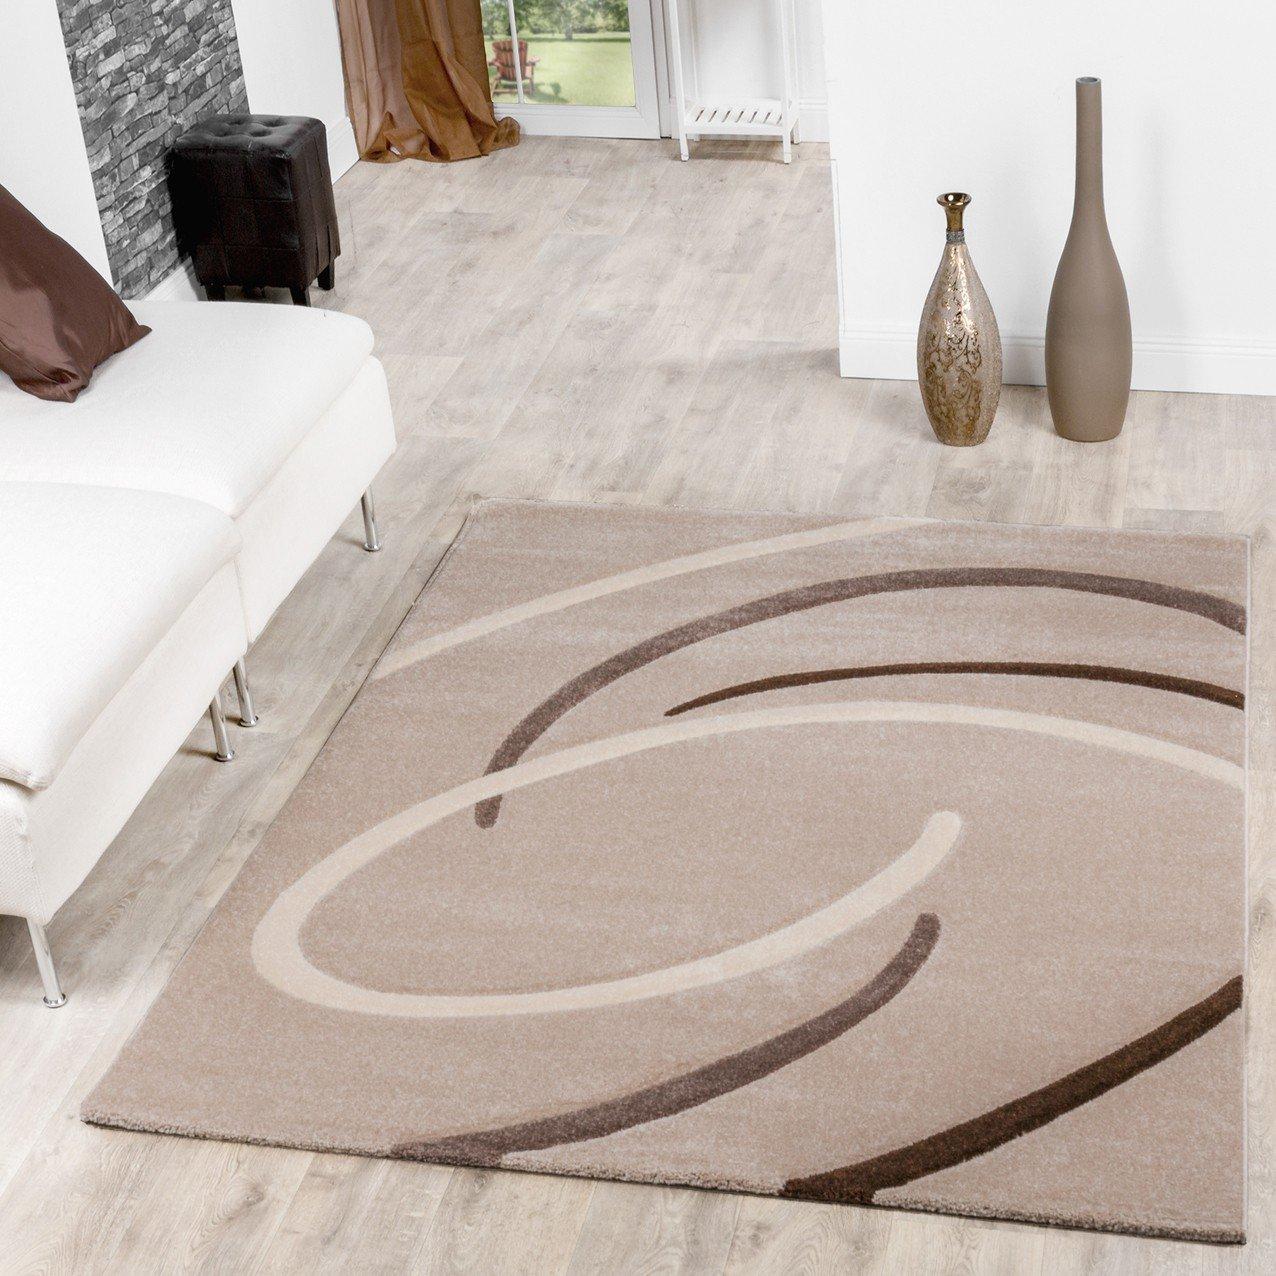 Poils courts ebro avec motif spirales beige tapis moderne salon ...